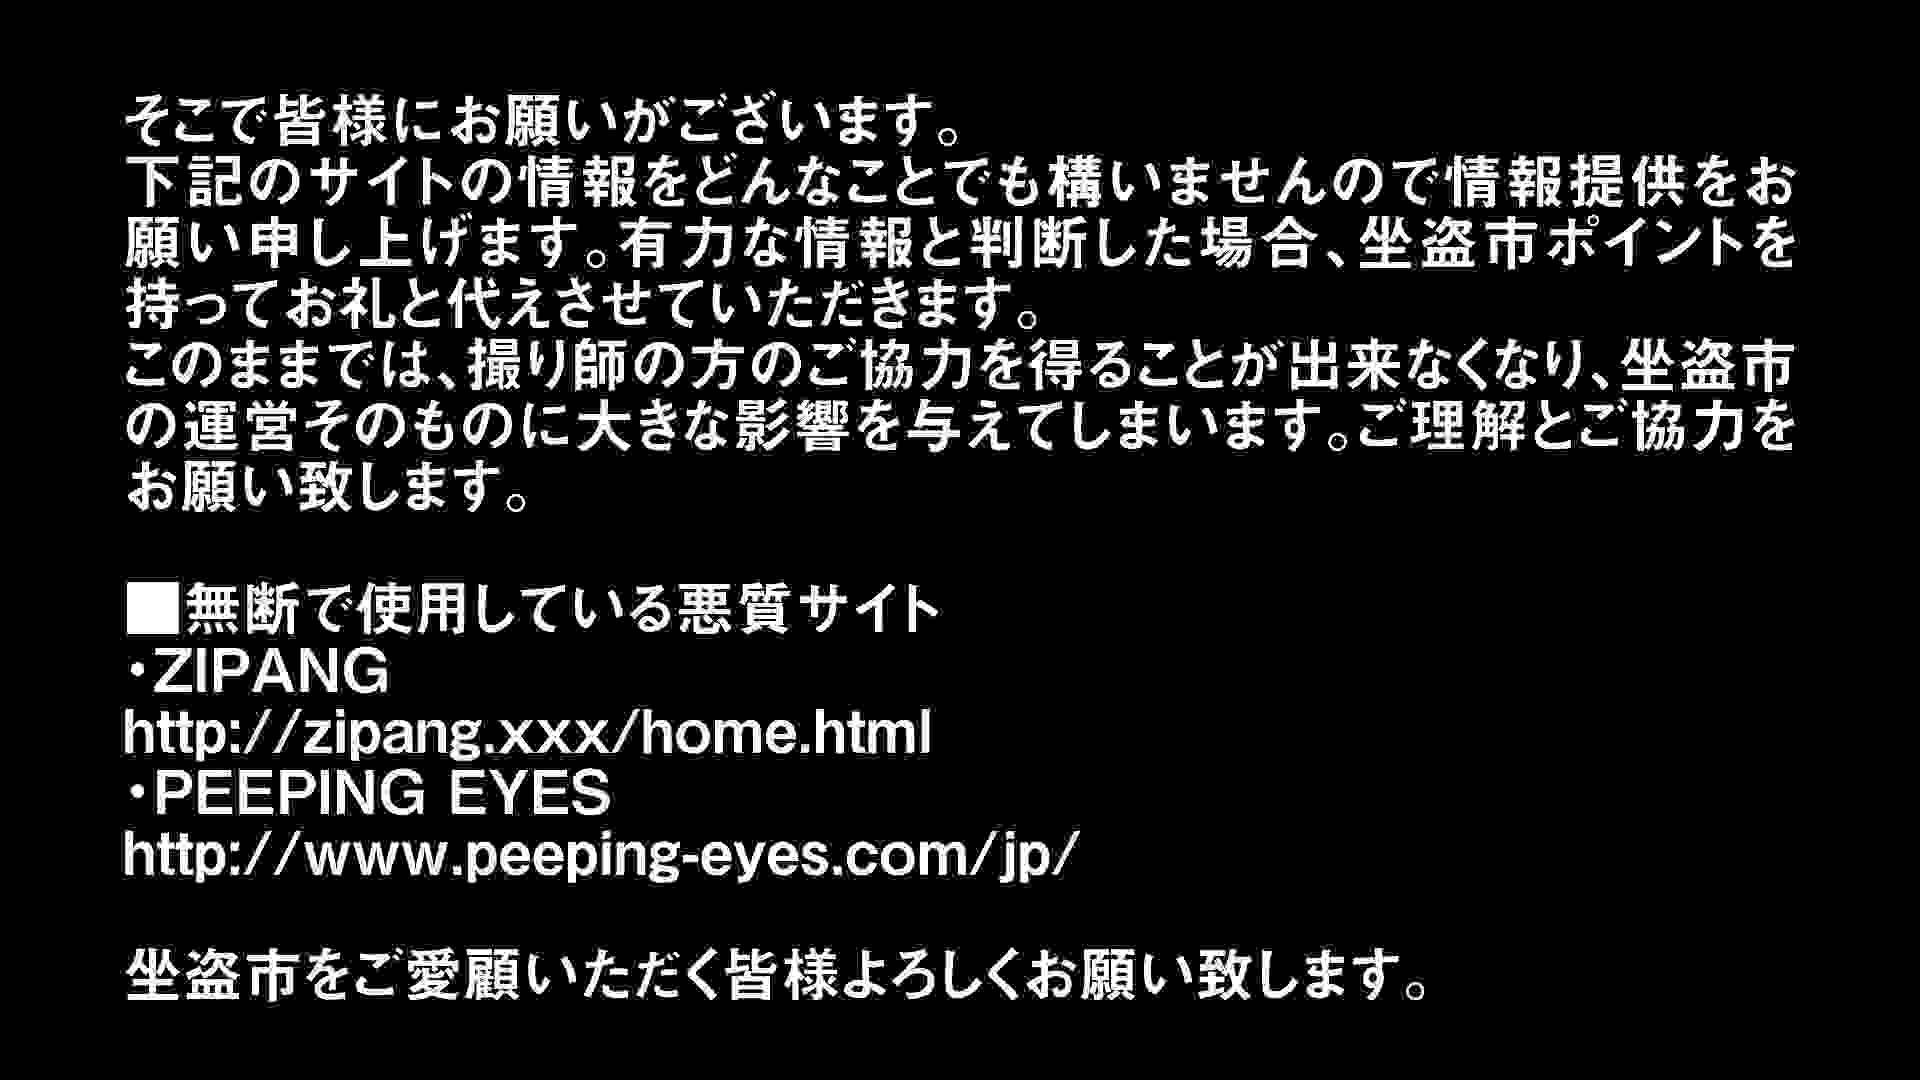 Aquaな露天風呂Vol.294 OLセックス | 盗撮  75画像 25